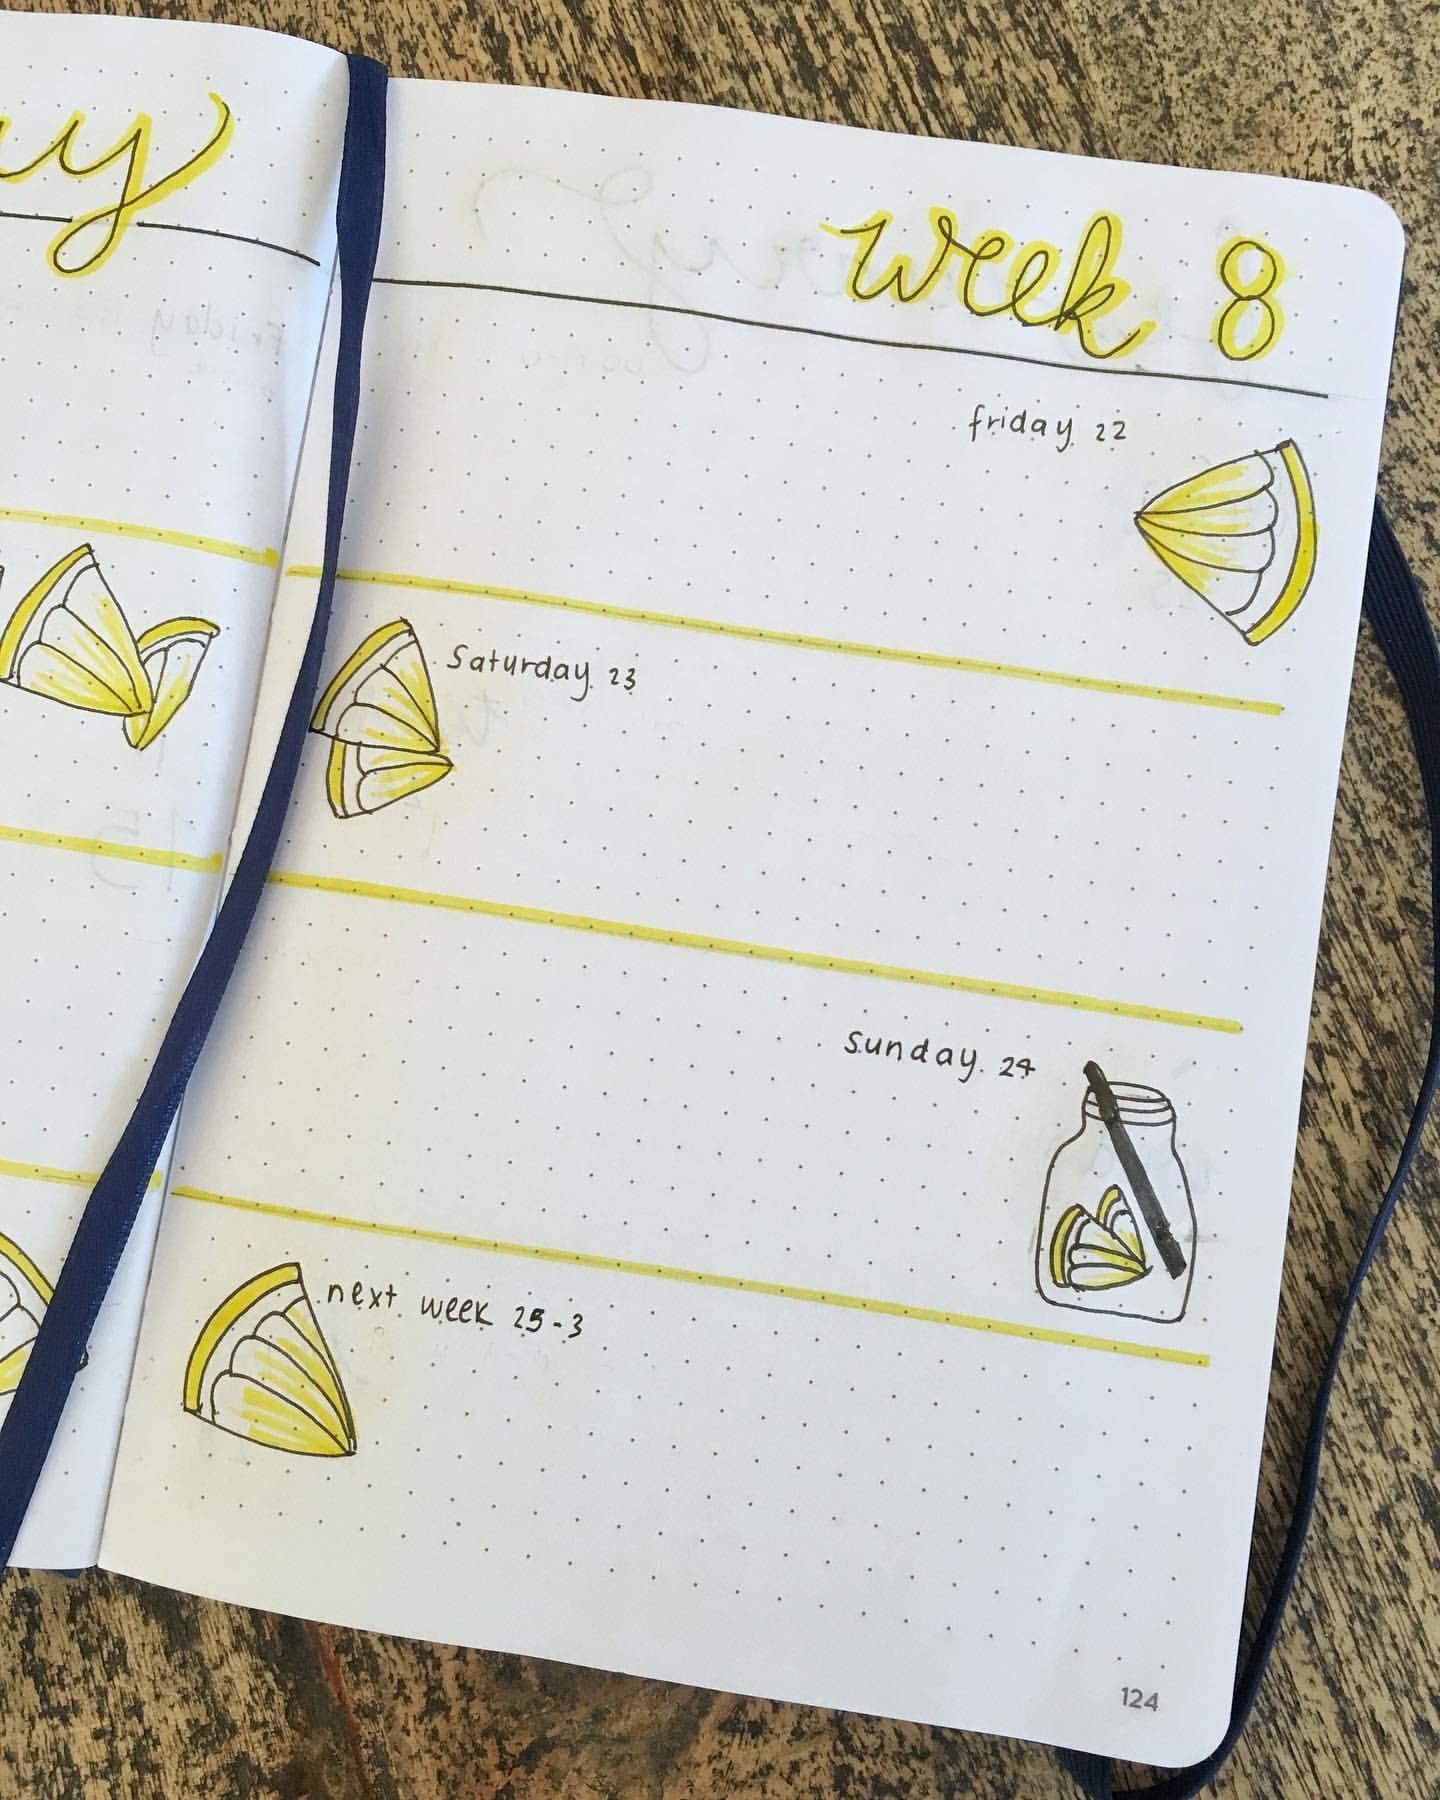 planner planners plannernerd plannergeek plannersetup weeklysetup weeklylog weeklyspread bujospread bujoweekly bujo bujojunkie bujojunkies